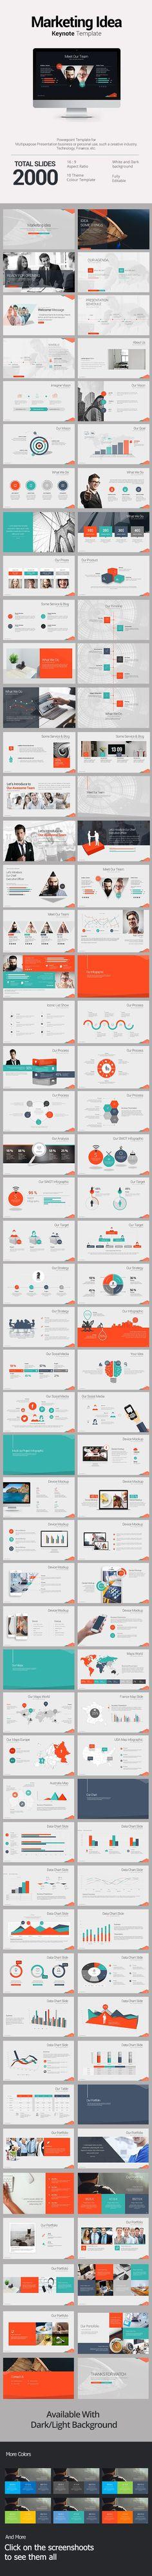 Marketing Idea Keynote Templates - #Keynote Templates #Presentation #Templates Download here: https://graphicriver.net/item/marketing-idea-keynote-templates/19604207?ref=alena994